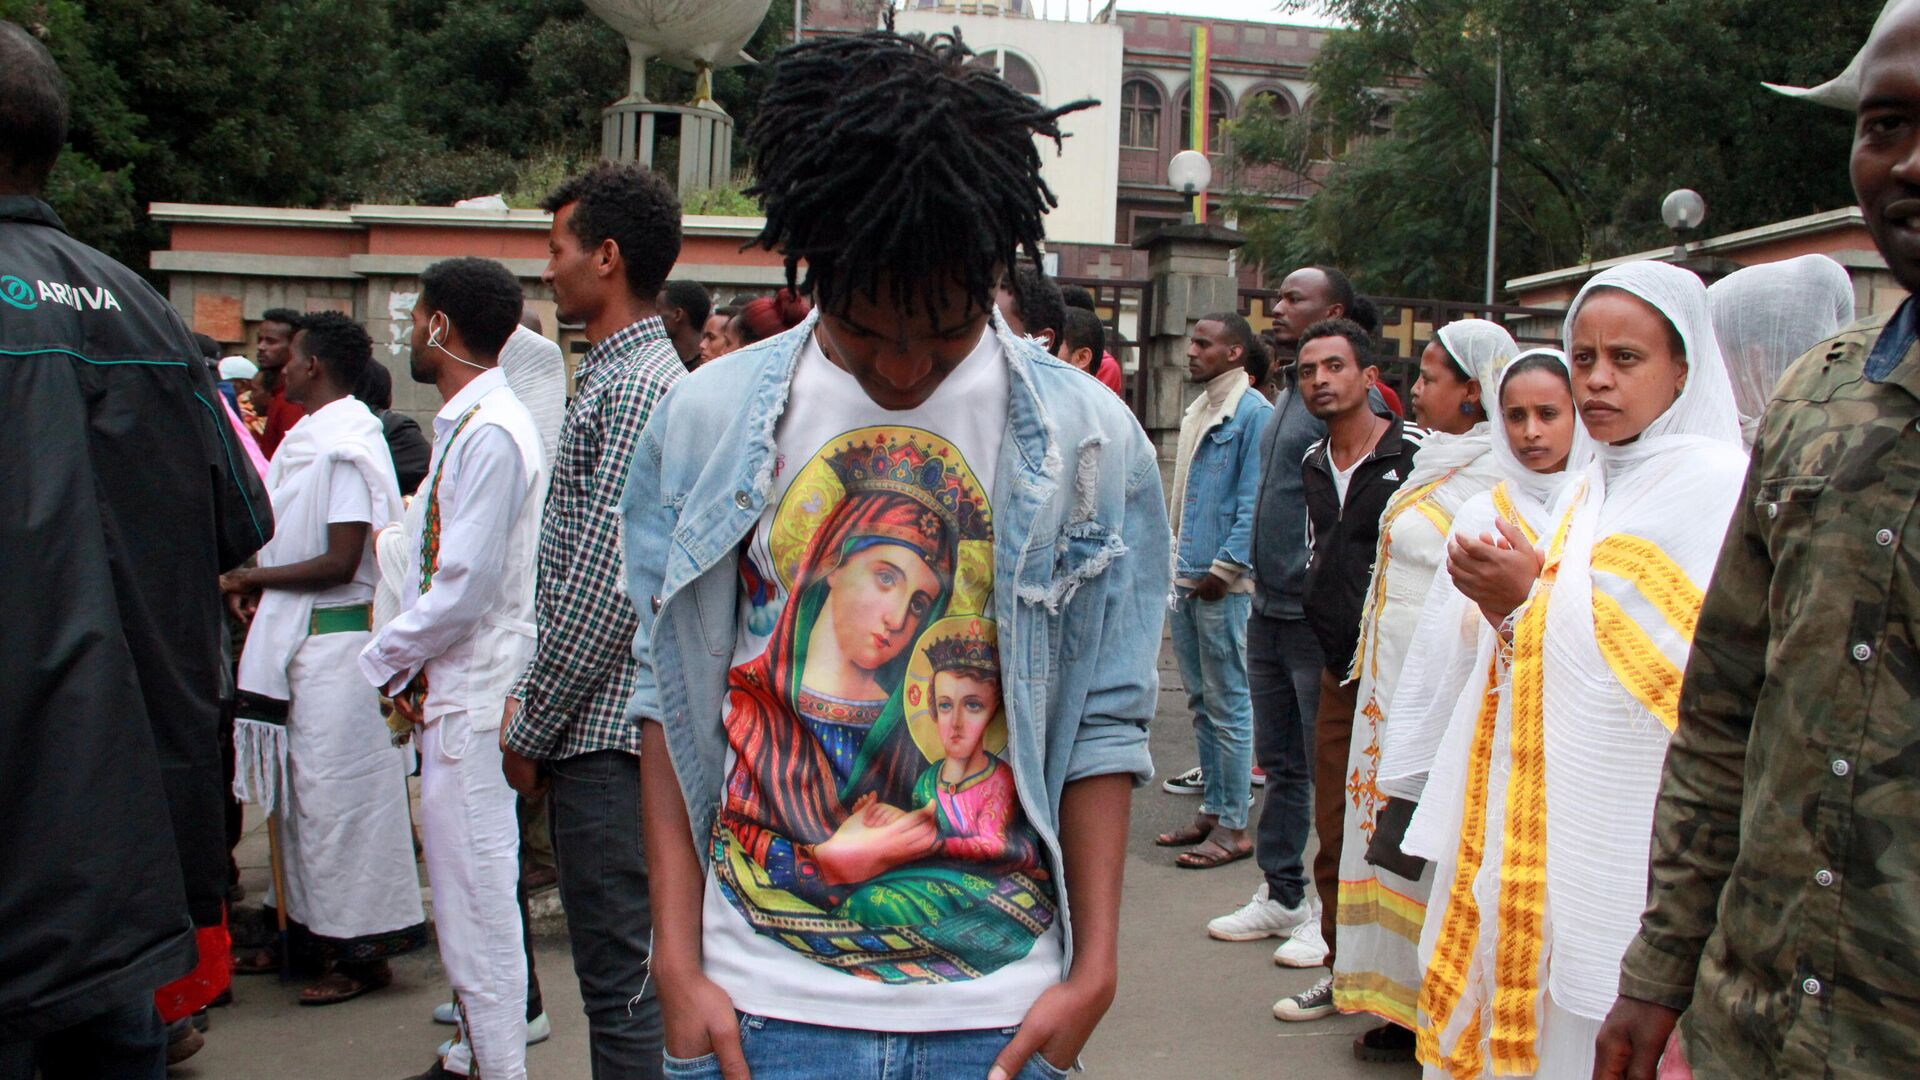 Празднование Мескеля в Аддис-Абебе, Эфиопия - РИА Новости, 1920, 27.09.2020